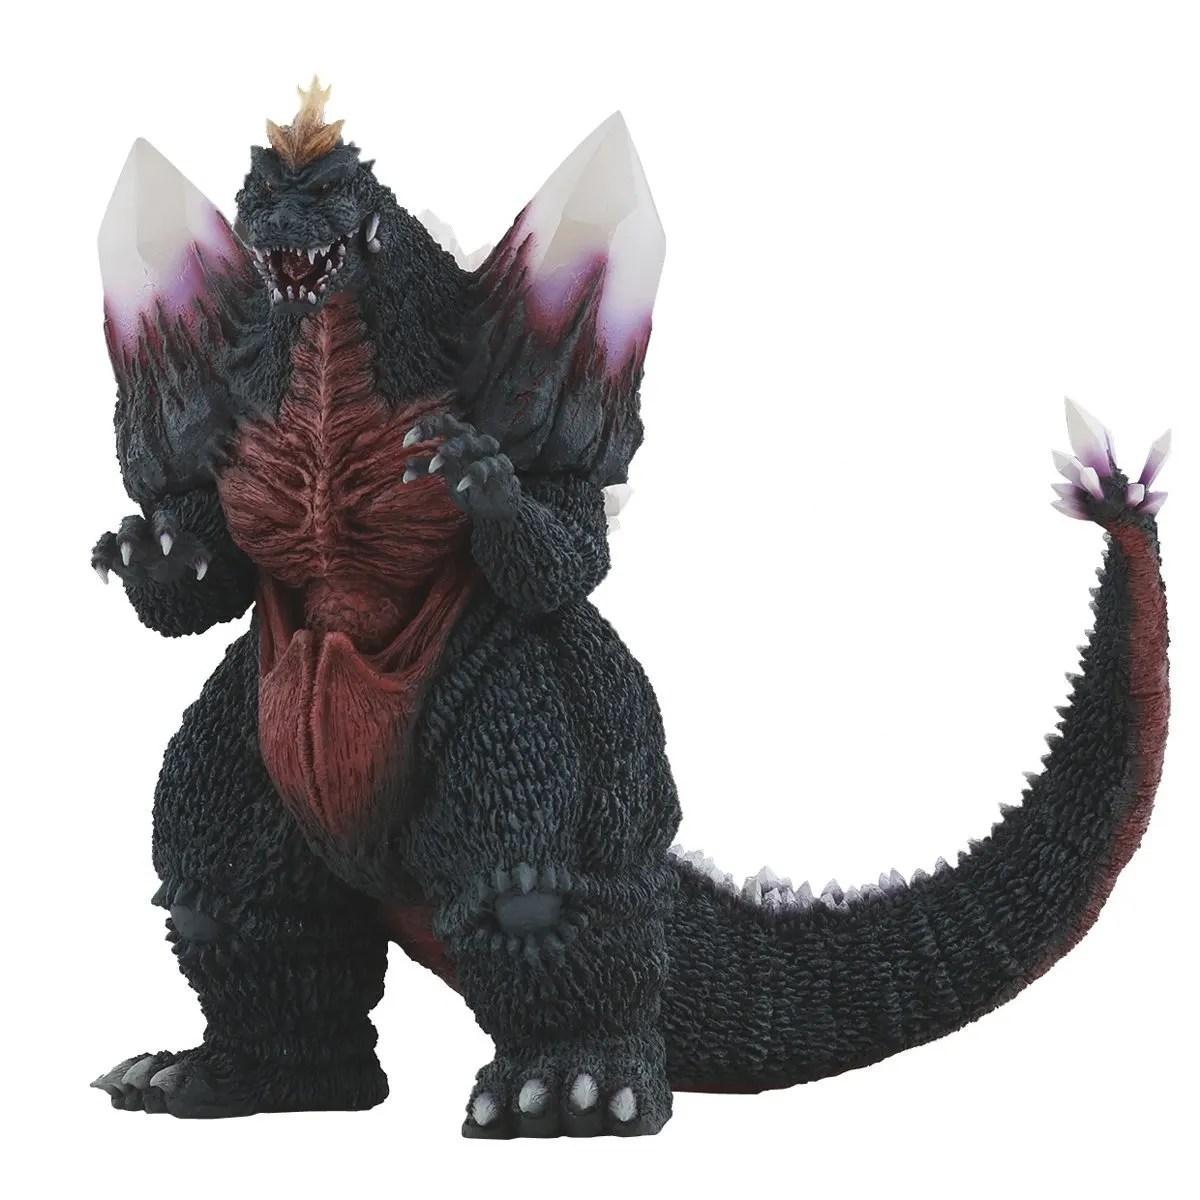 Toho Daikaiju Series Godzilla Vs SpaceGodzilla Space